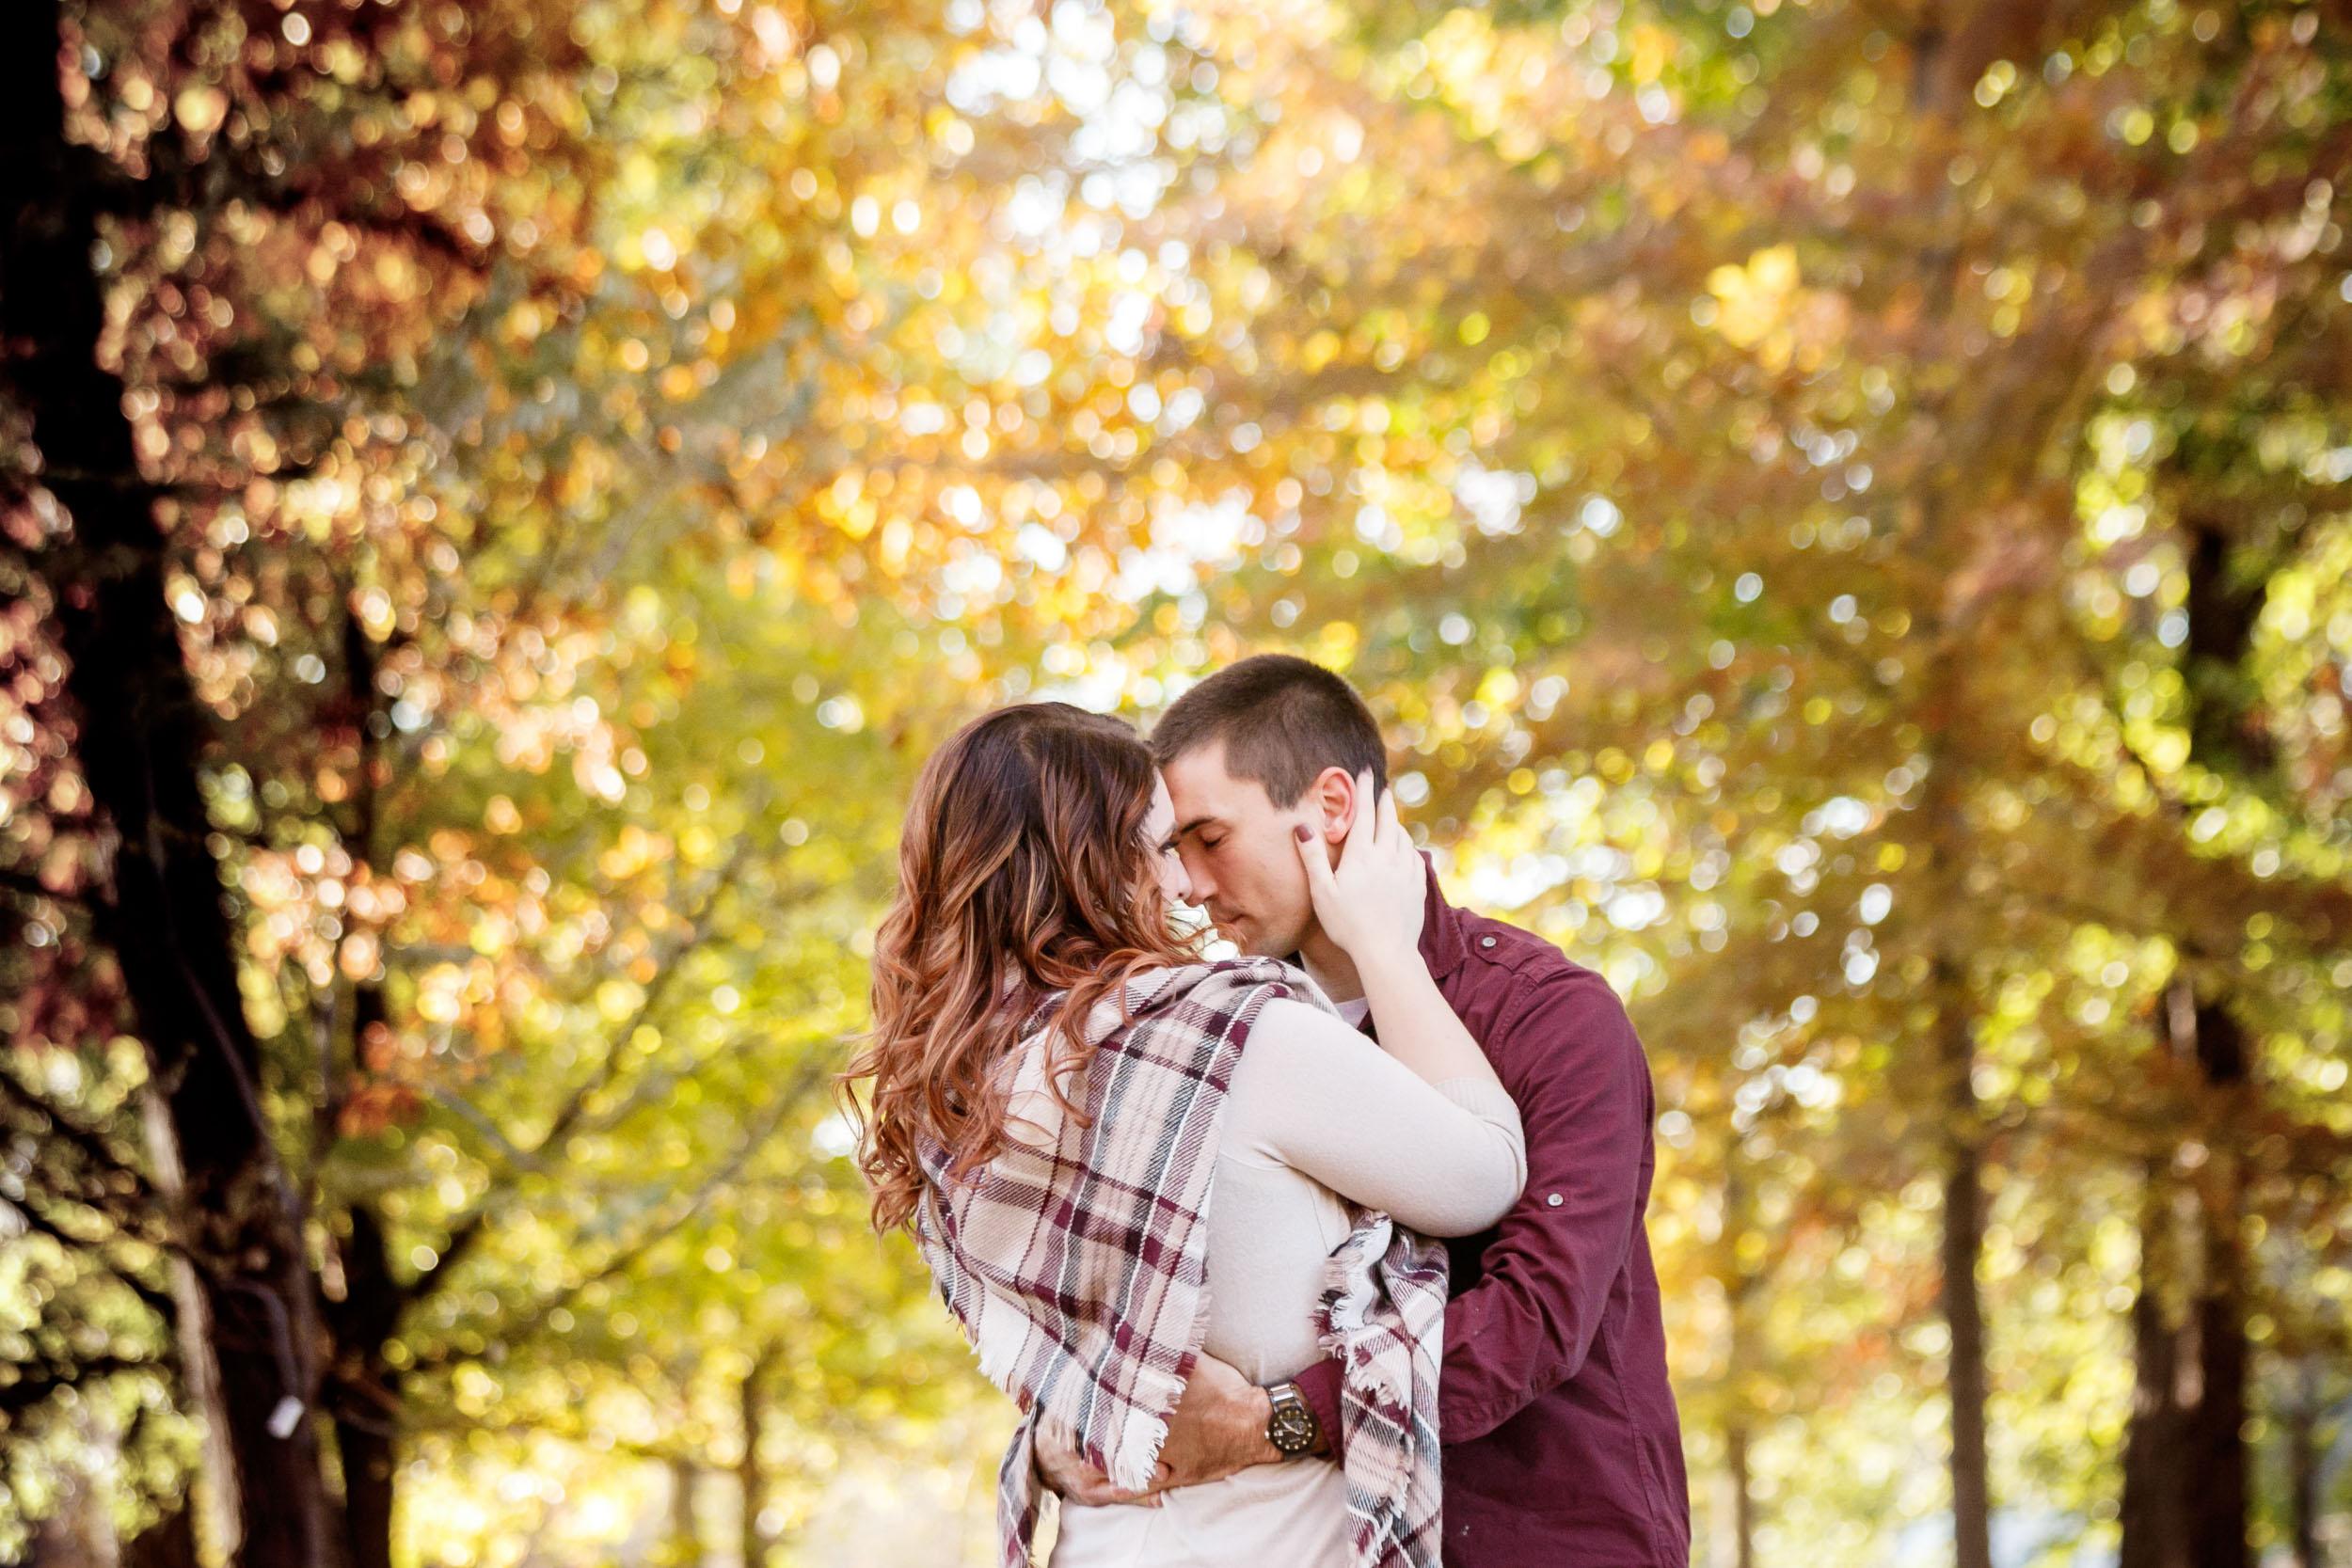 fall-engagement-photos-riverside-park-neenah-wisconsin--adam-shea-photography-green-bay-appleton-neenah-photographer-22.jpg